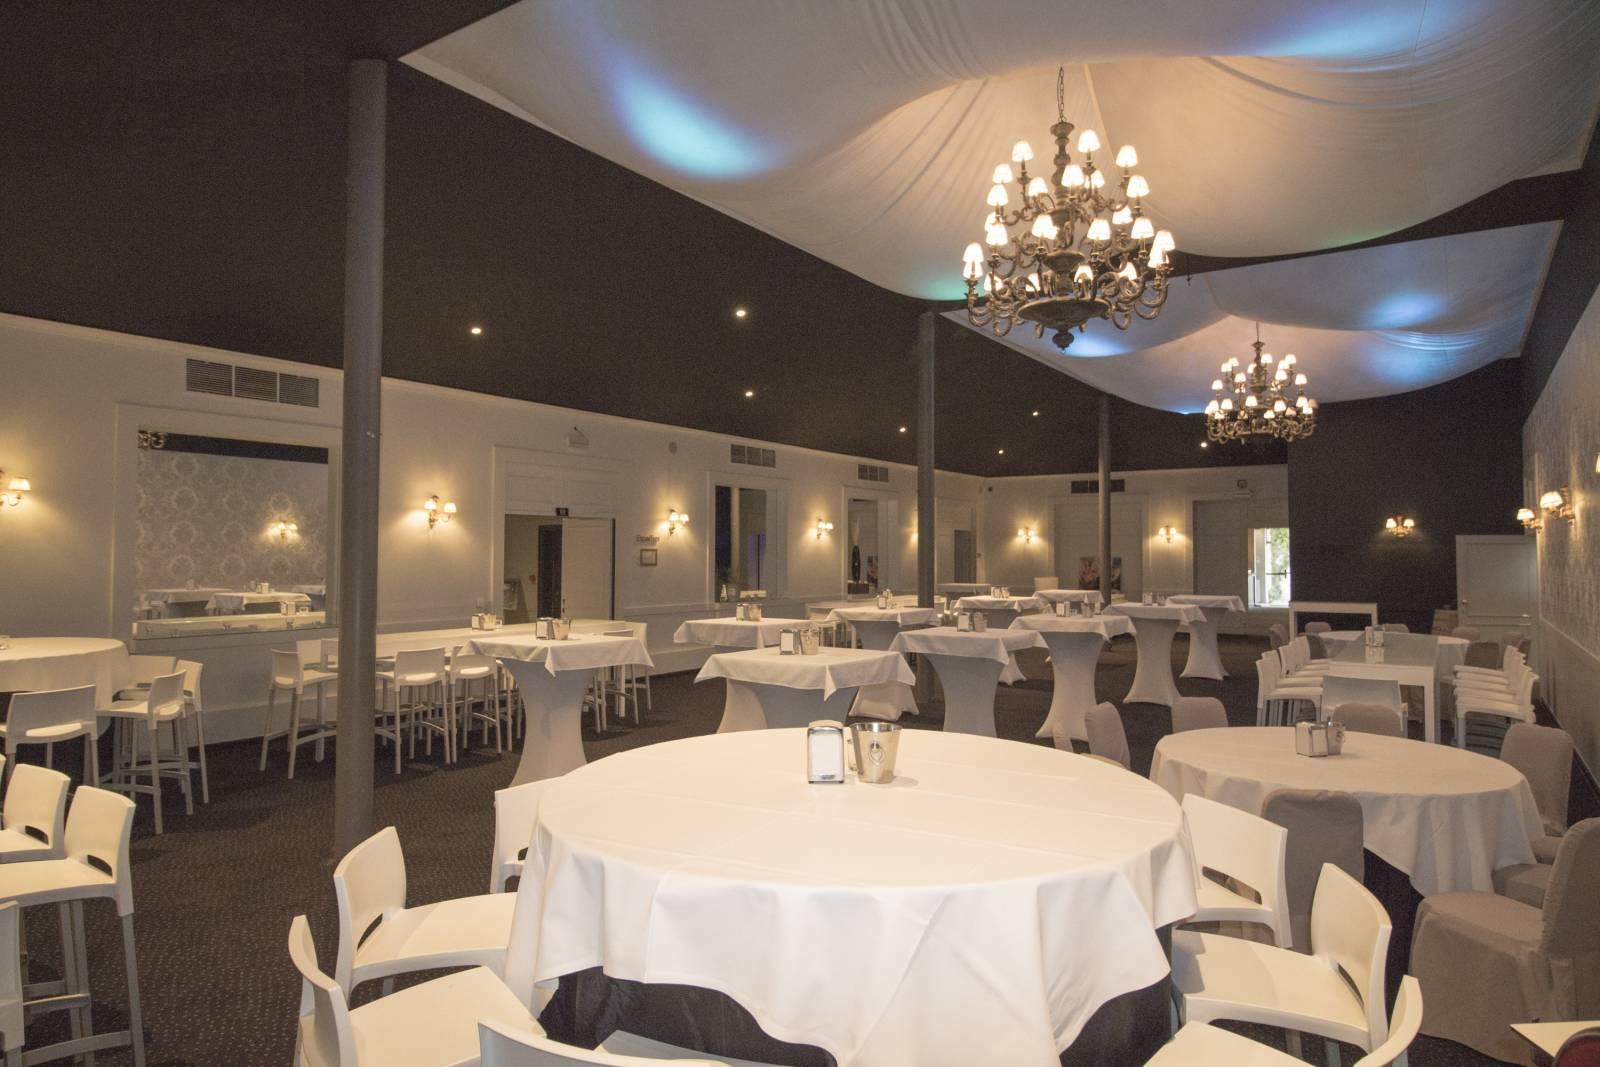 Cortina Wevelgem - Feestzaal - House of Weddings (3)